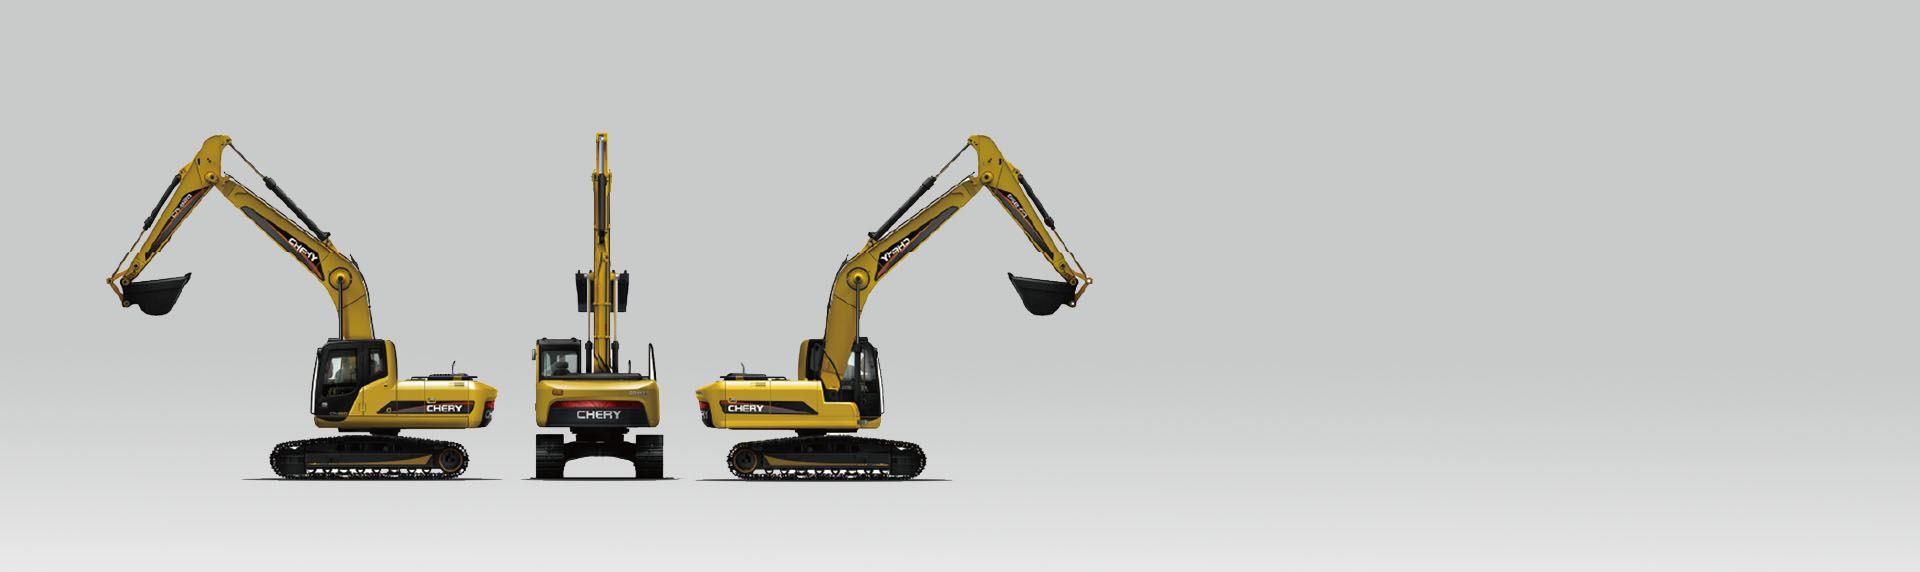 TMT娱乐-奇瑞挖掘机